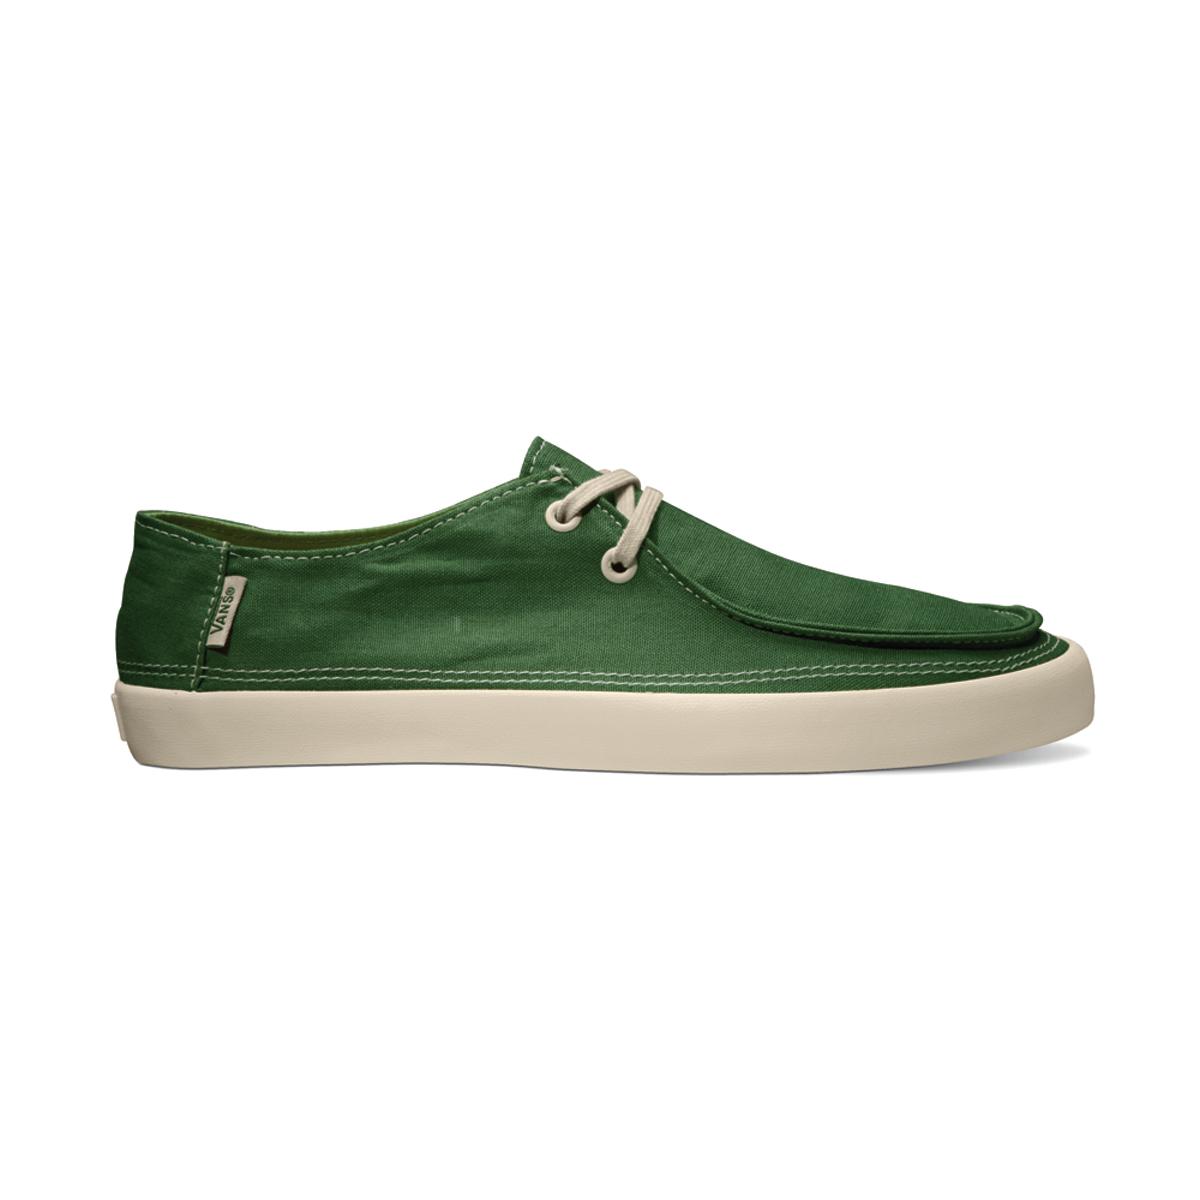 Vans Summer Shoes